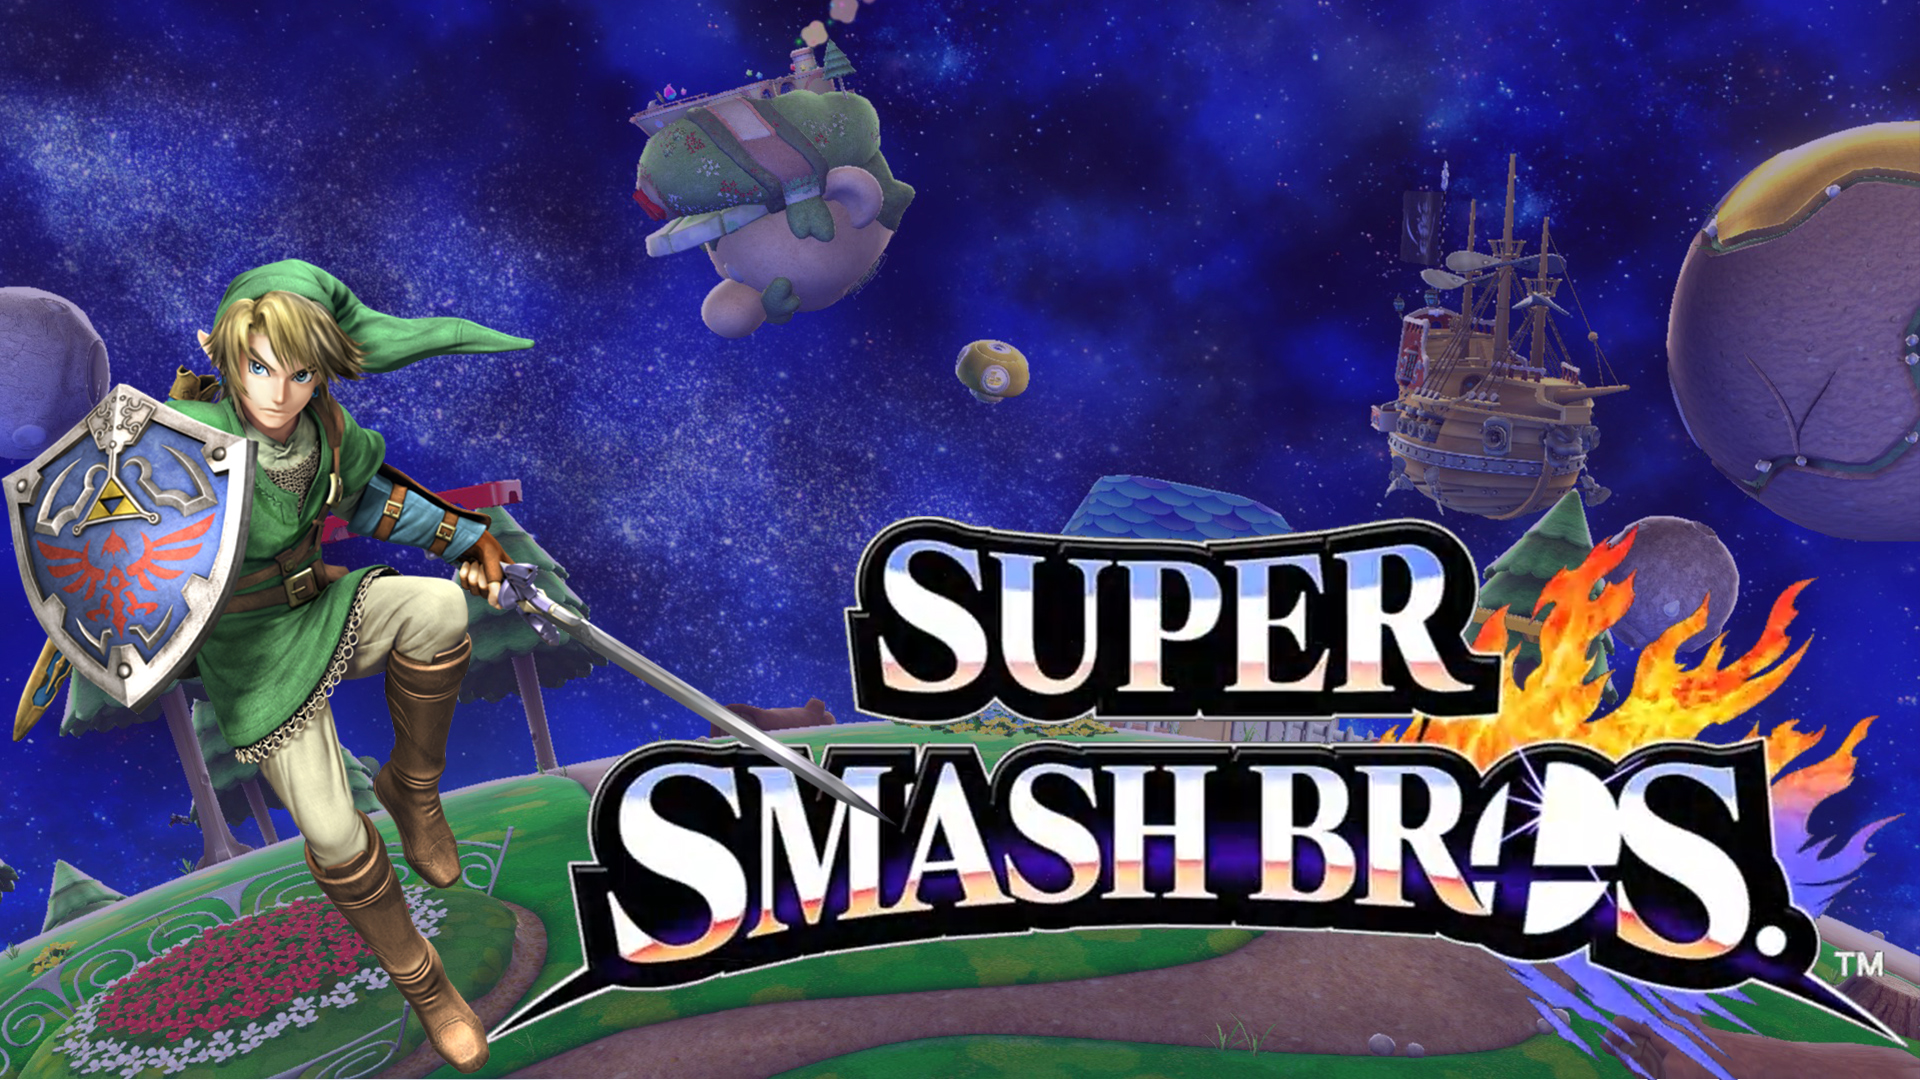 Nacon Smash Bros. Wii U